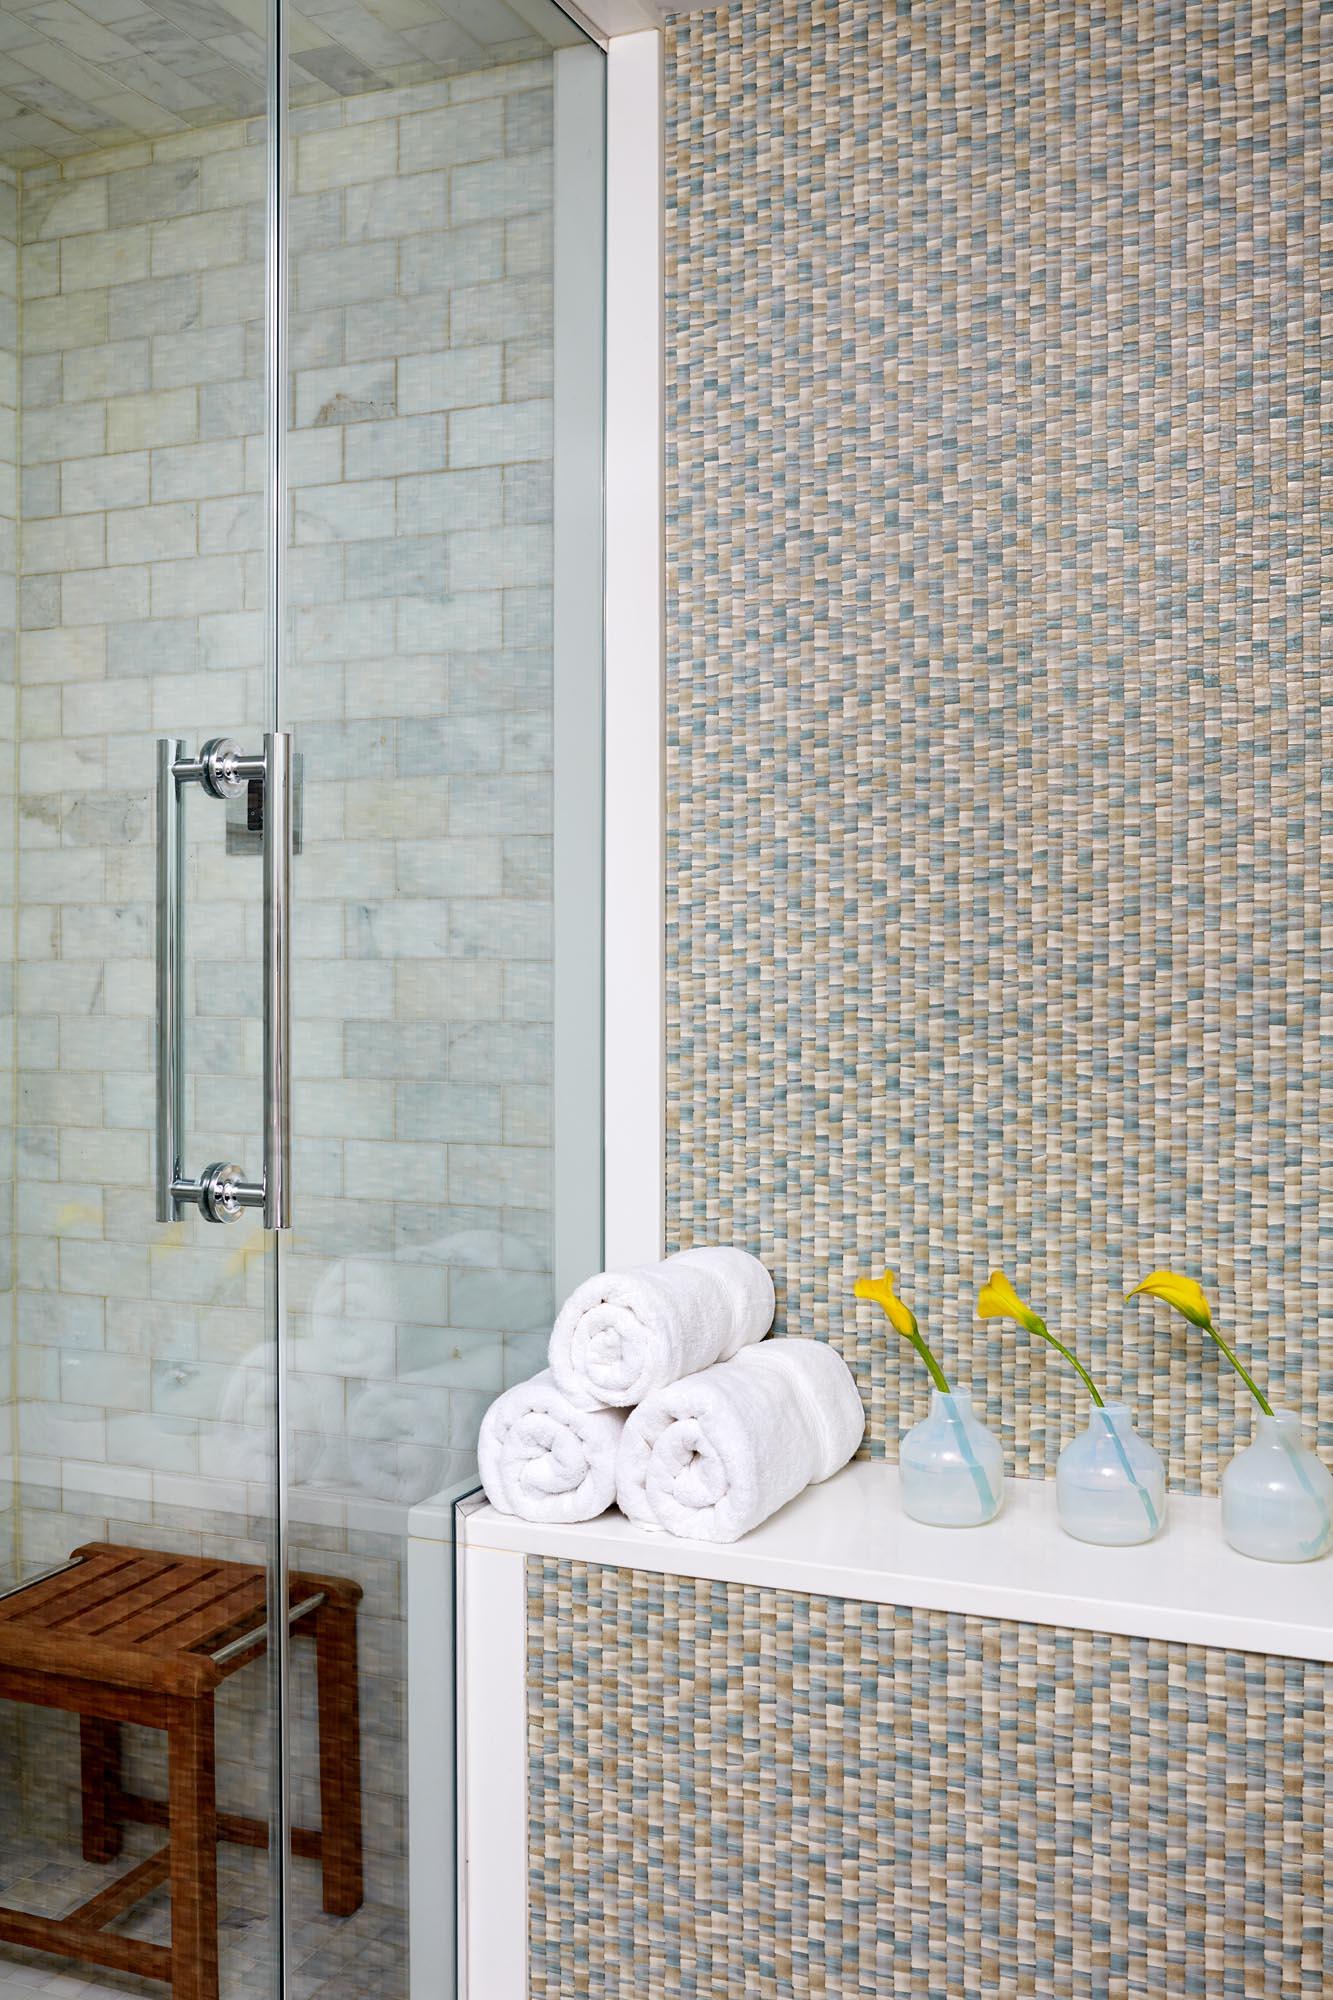 Boston bathroom interior design by Dane Austin Design